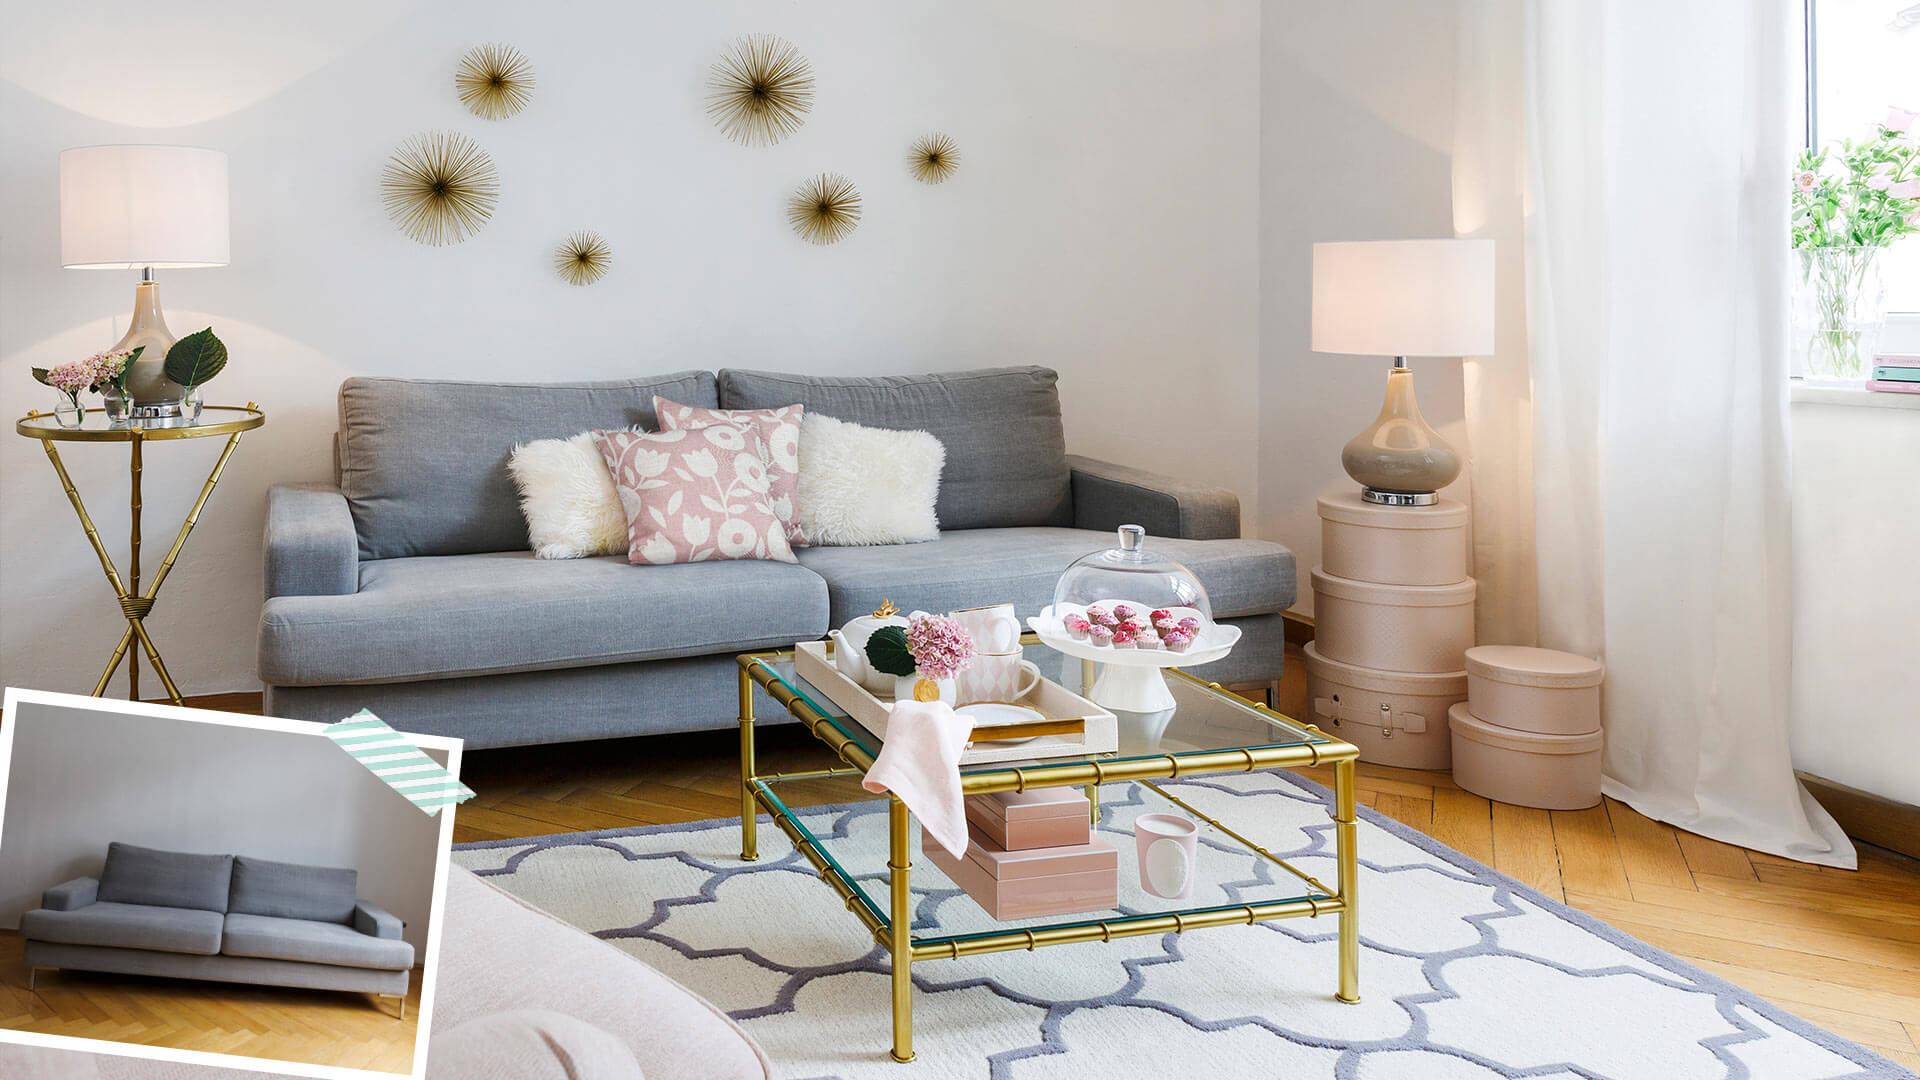 Sofa-Style: Girly